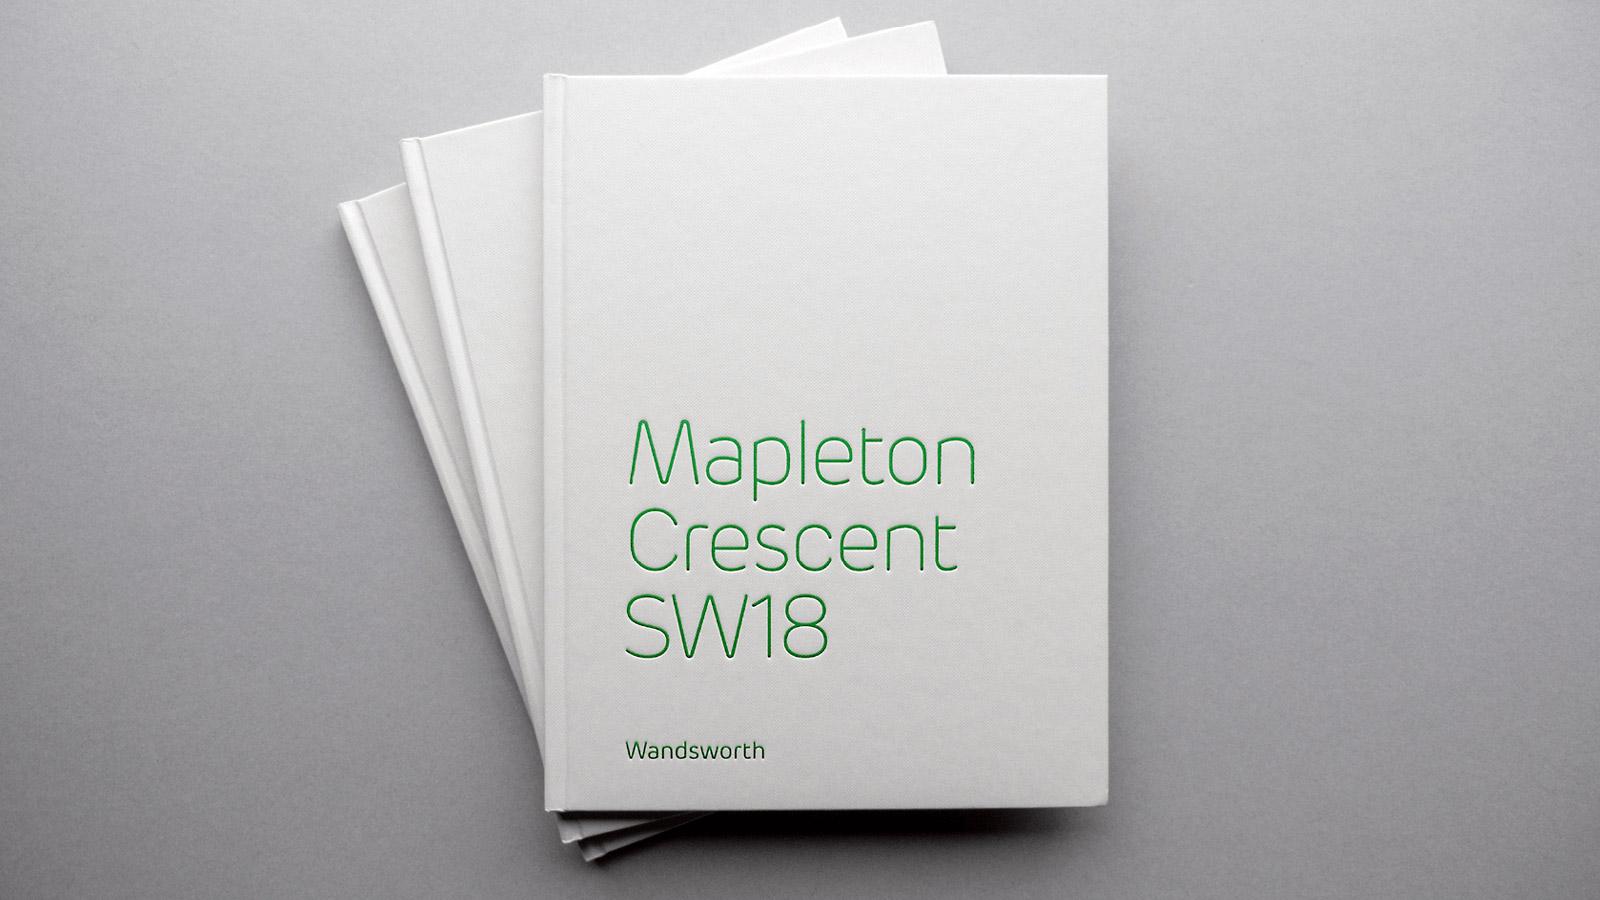 property-marketing-design-architecture-building-book-brochure-milton-keynes-london-1